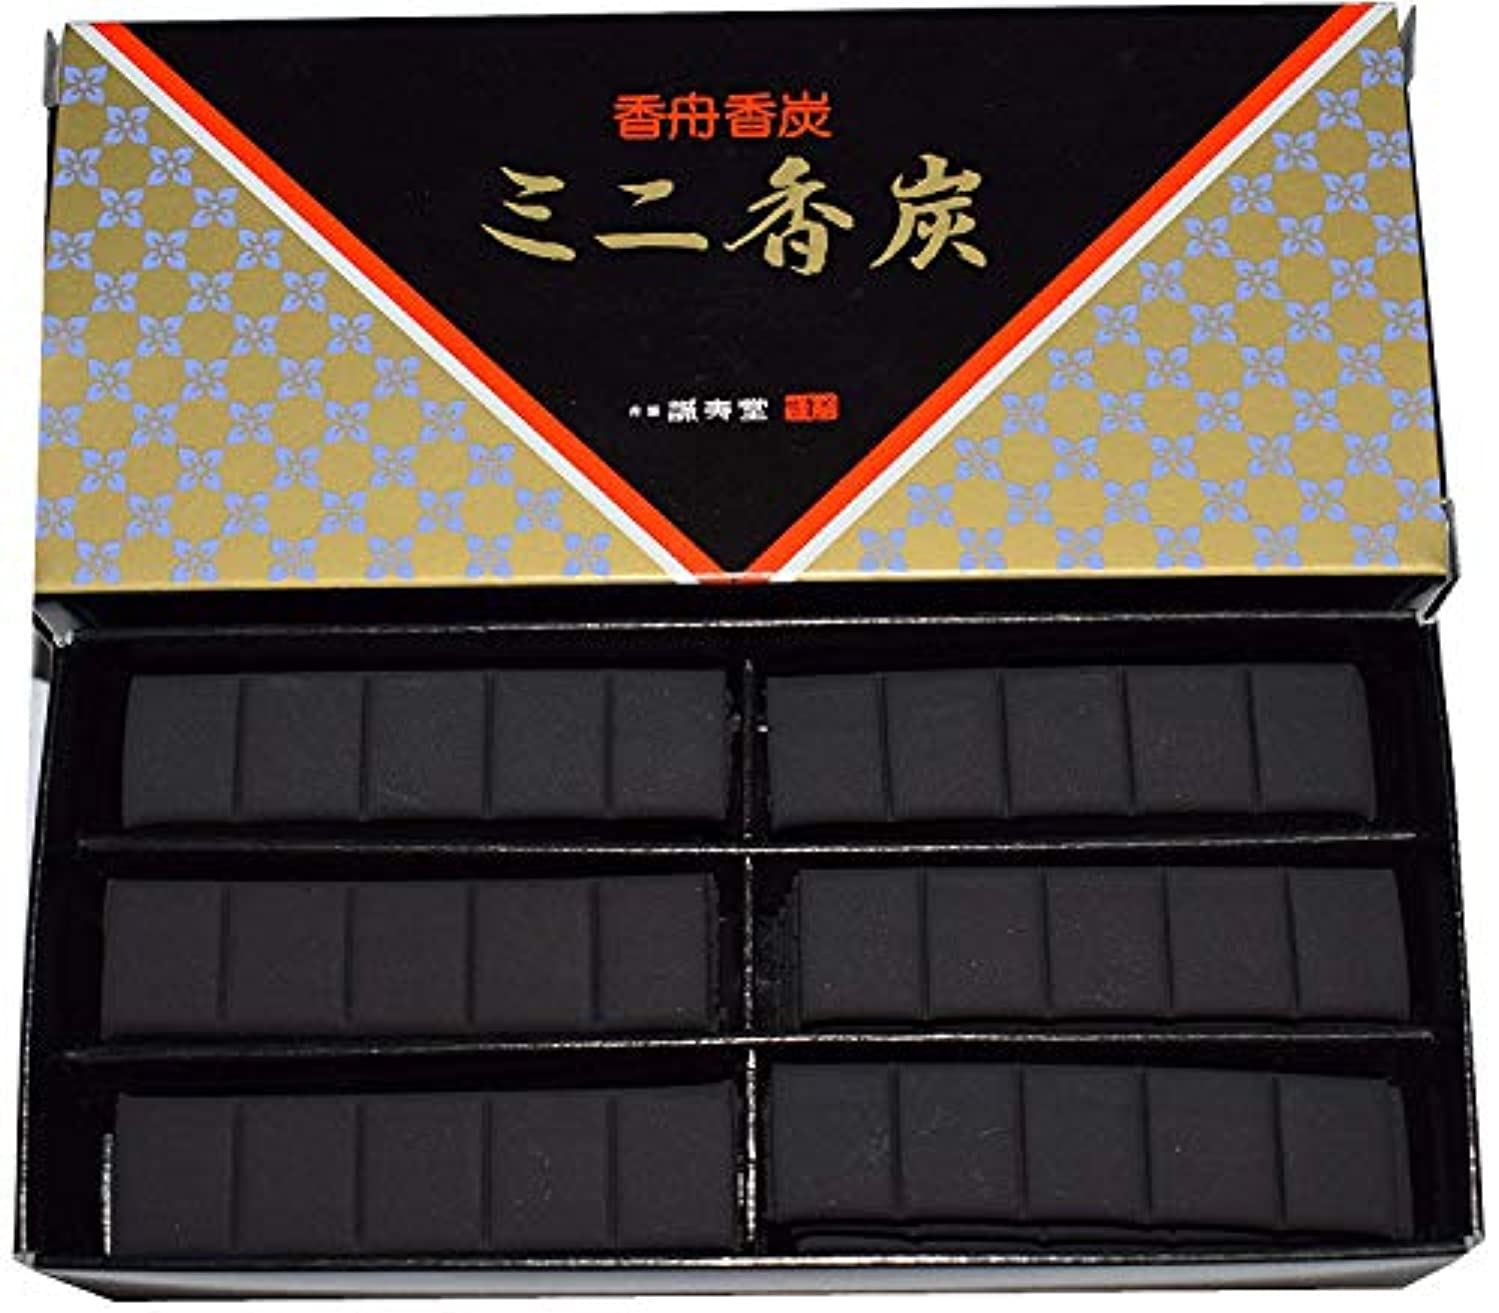 妥協後退する国民投票香舗 誠寿堂ミニ香炉炭 (黒, 5)